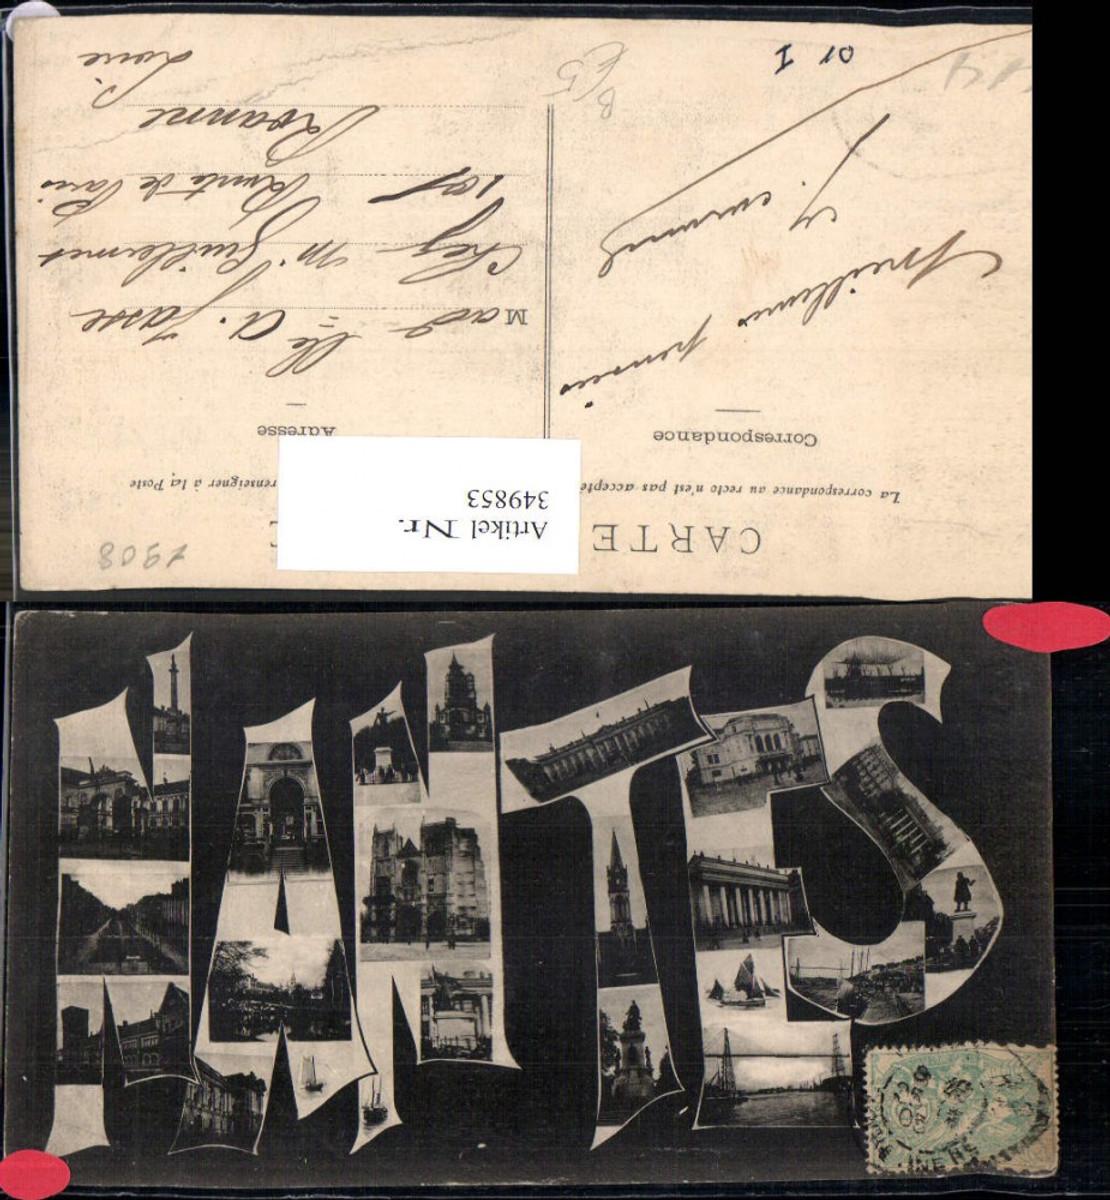 349853,Pays de la Loire Loire-Atlantique Nantes Buchstaben Collage Mehrbildkarte  günstig online kaufen